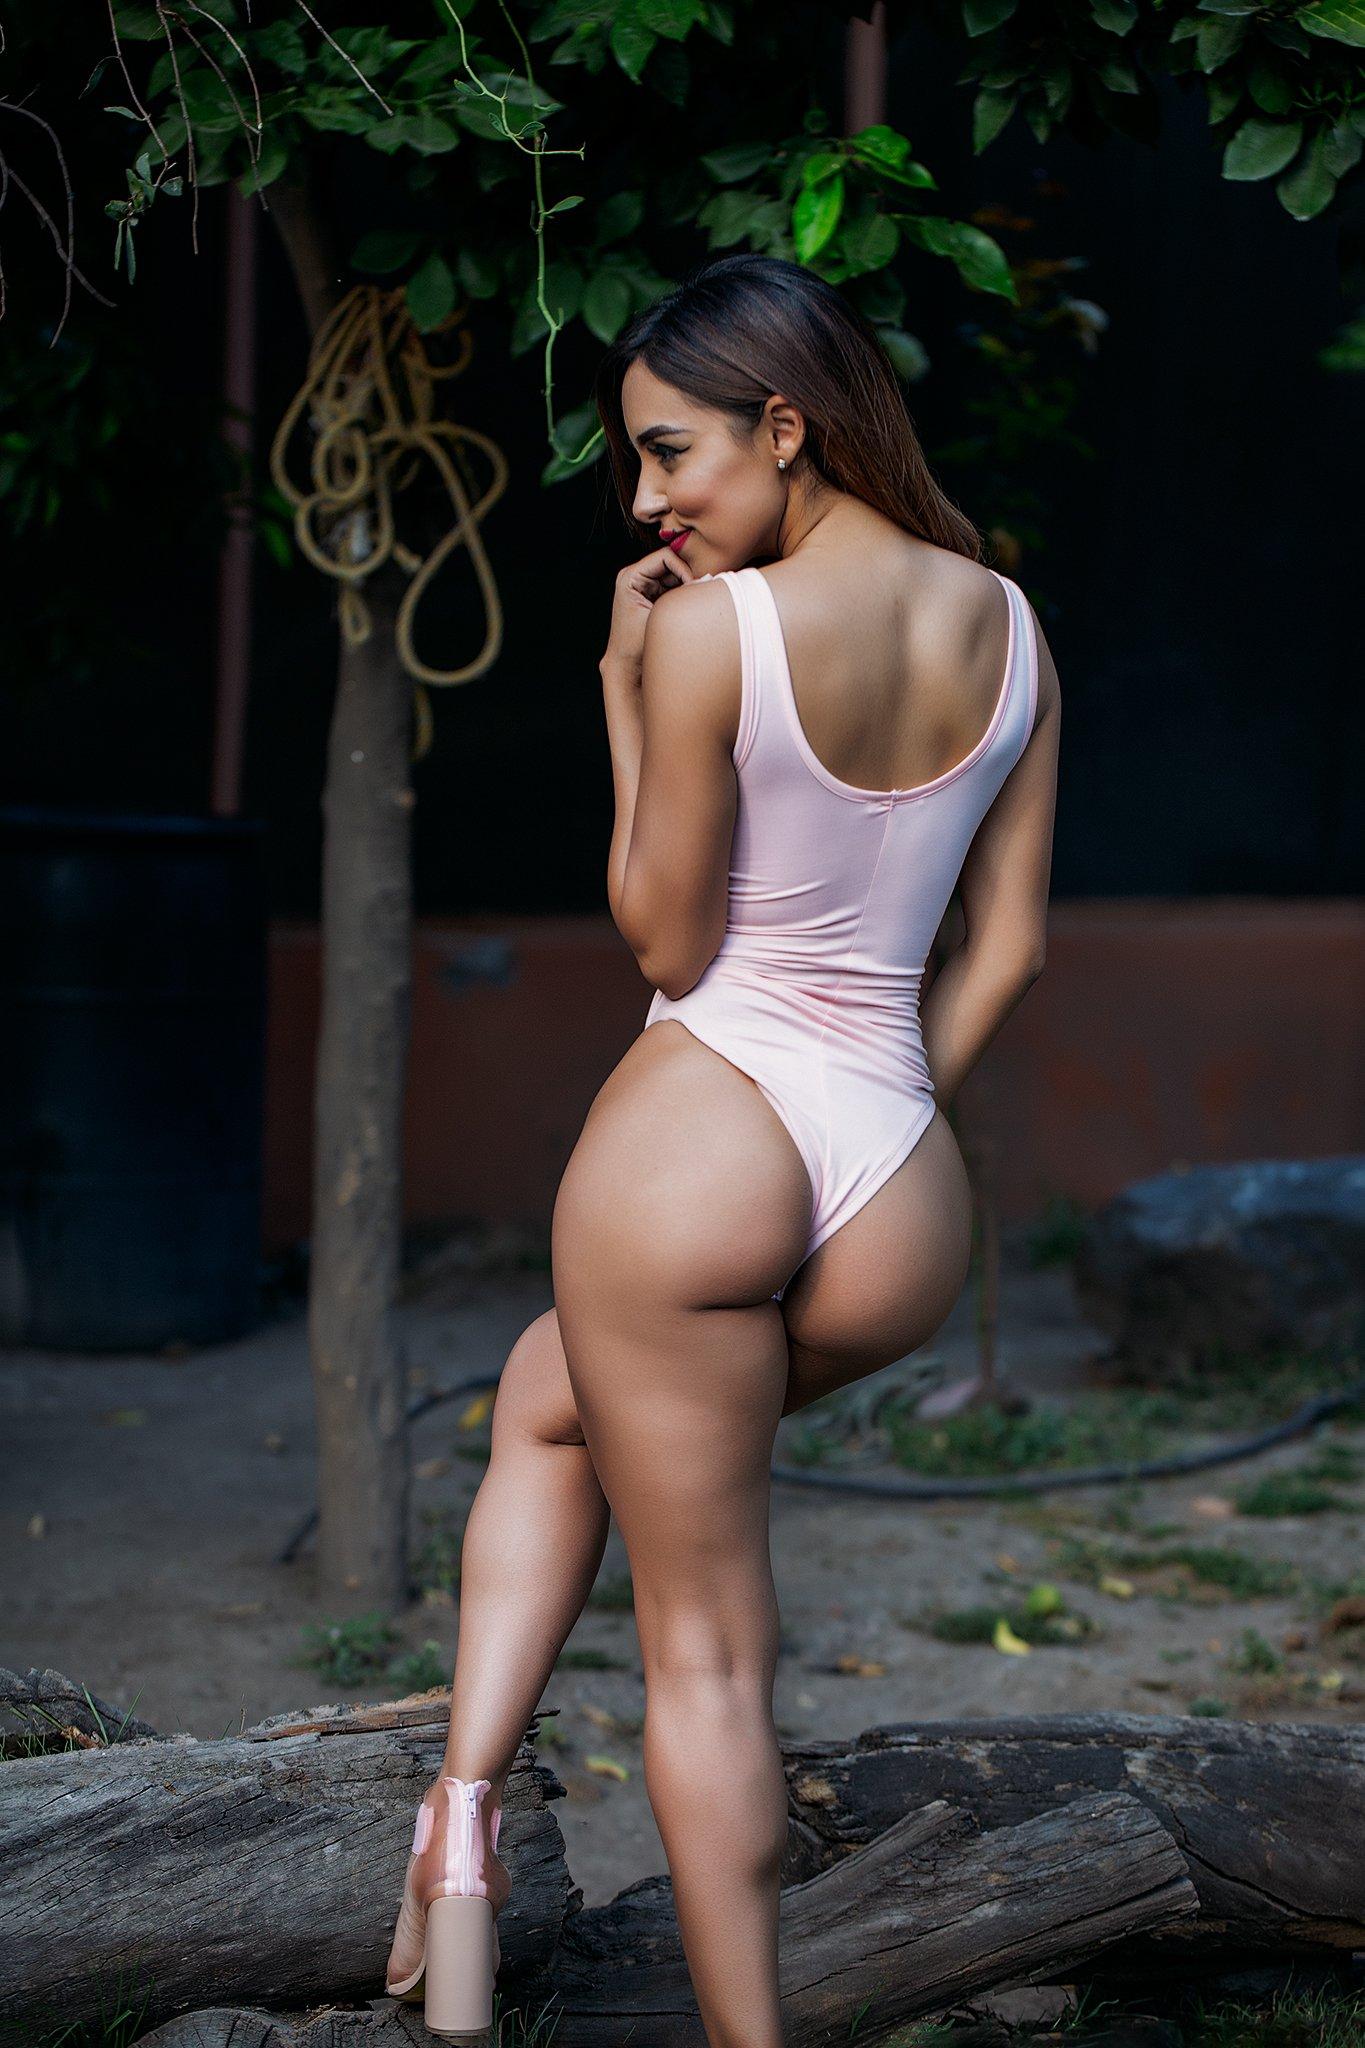 sexy, fashion, hot, latin, fitness, latin, mexican, girl, curves, hot, abs, сексуальный, горячий, дамское белье, Luis Gastón